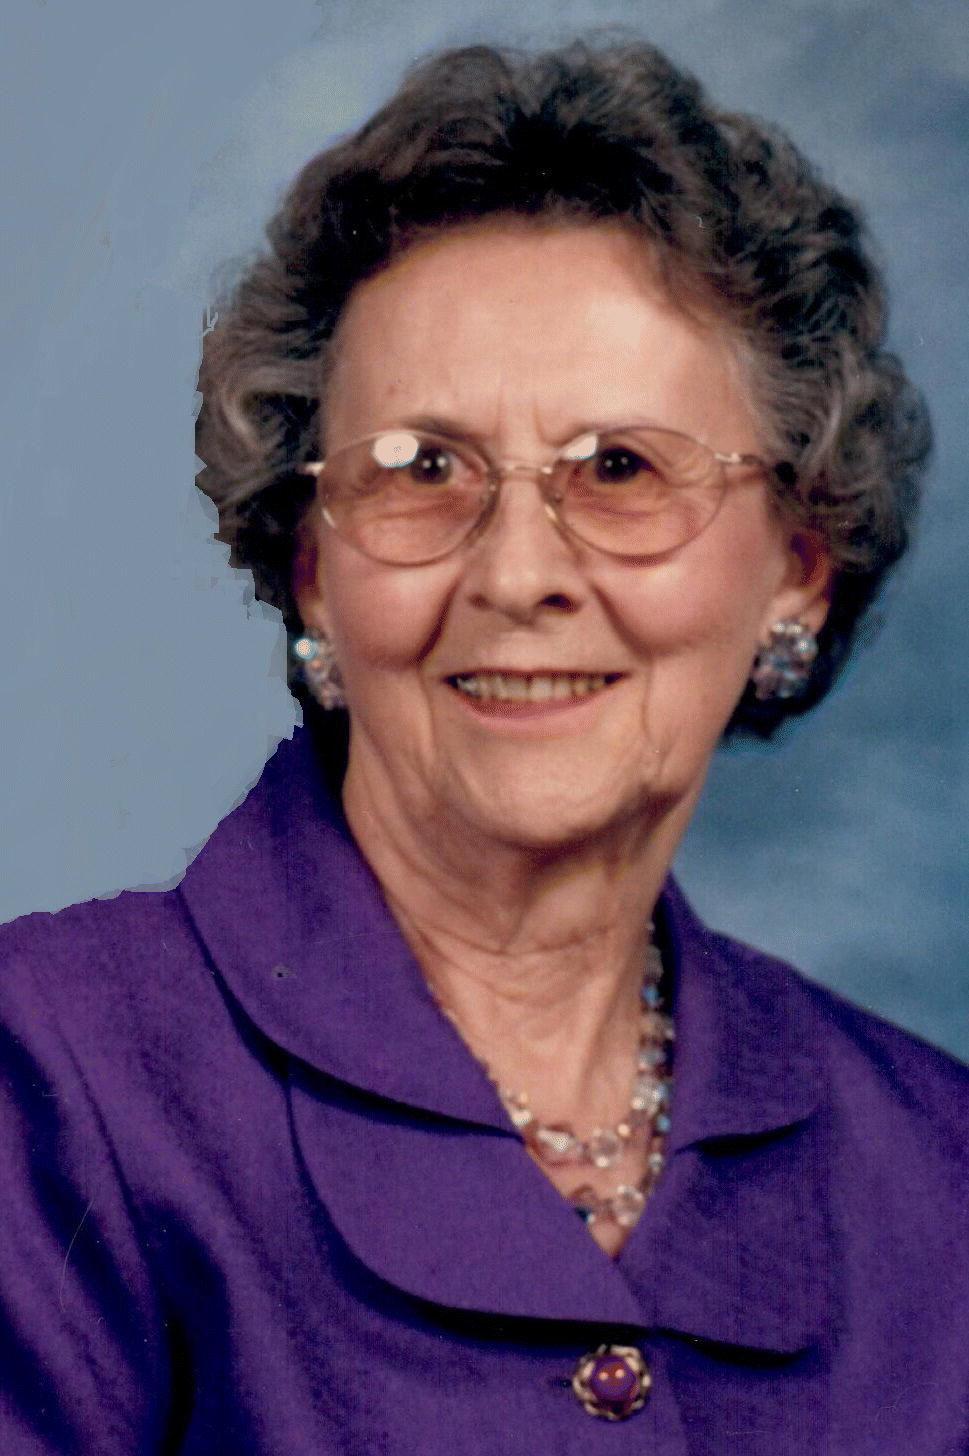 Dorothy Gerber